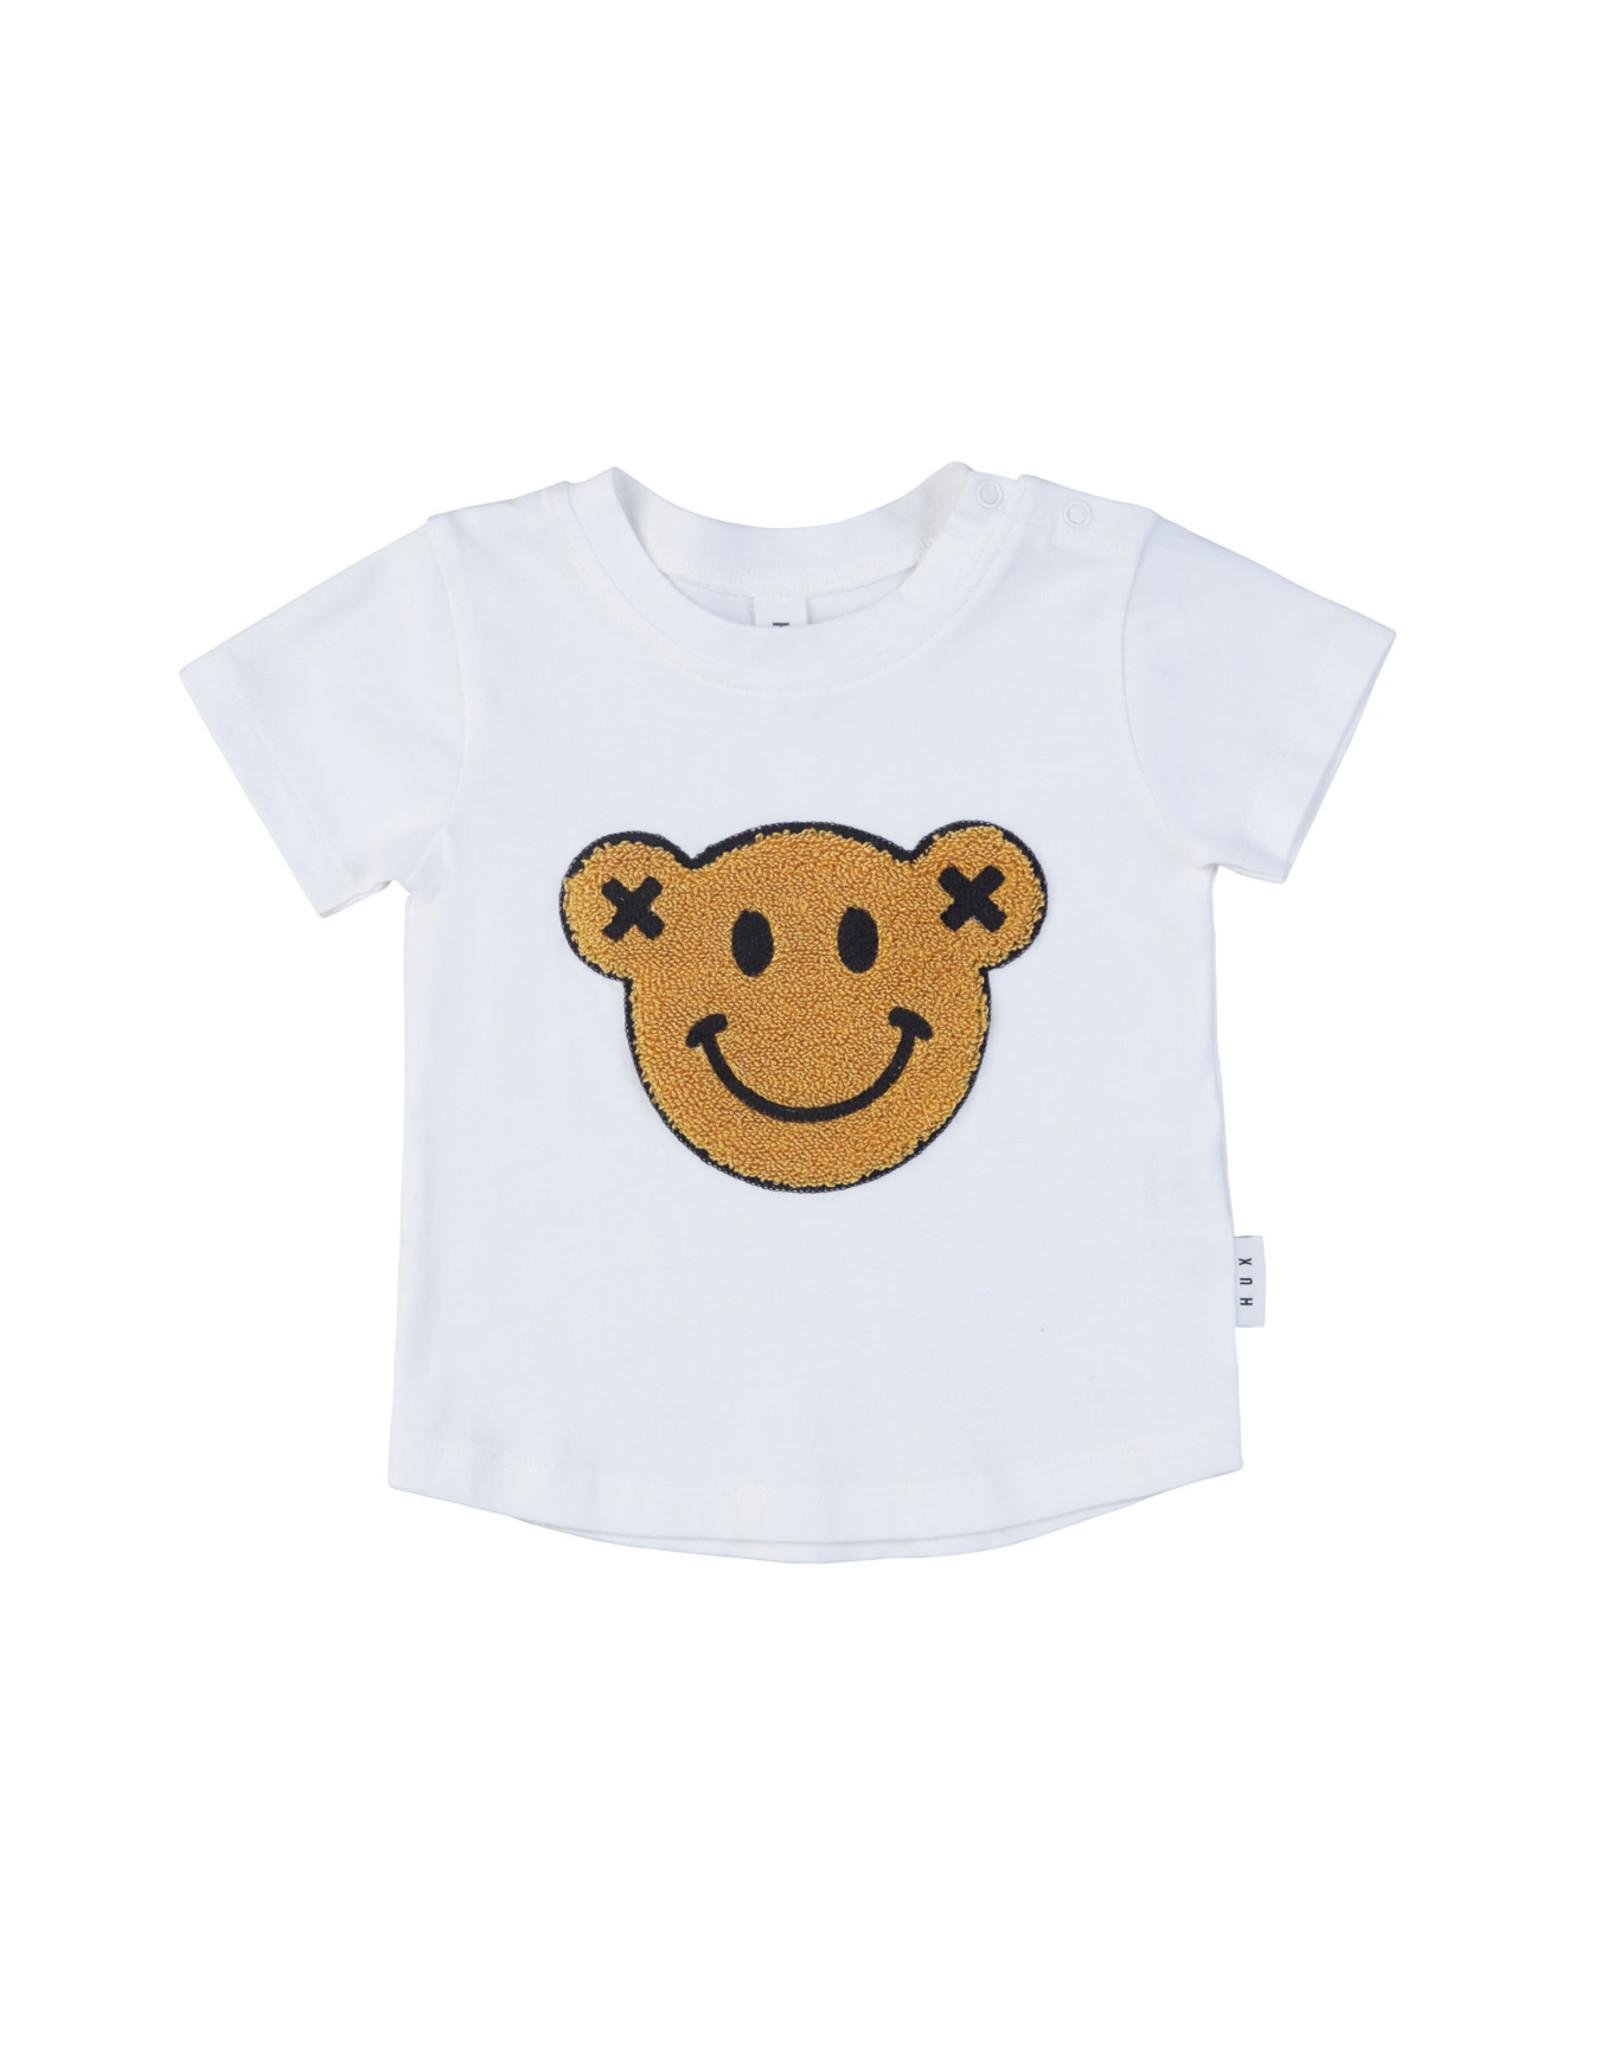 Huxbaby Smiley Tee White